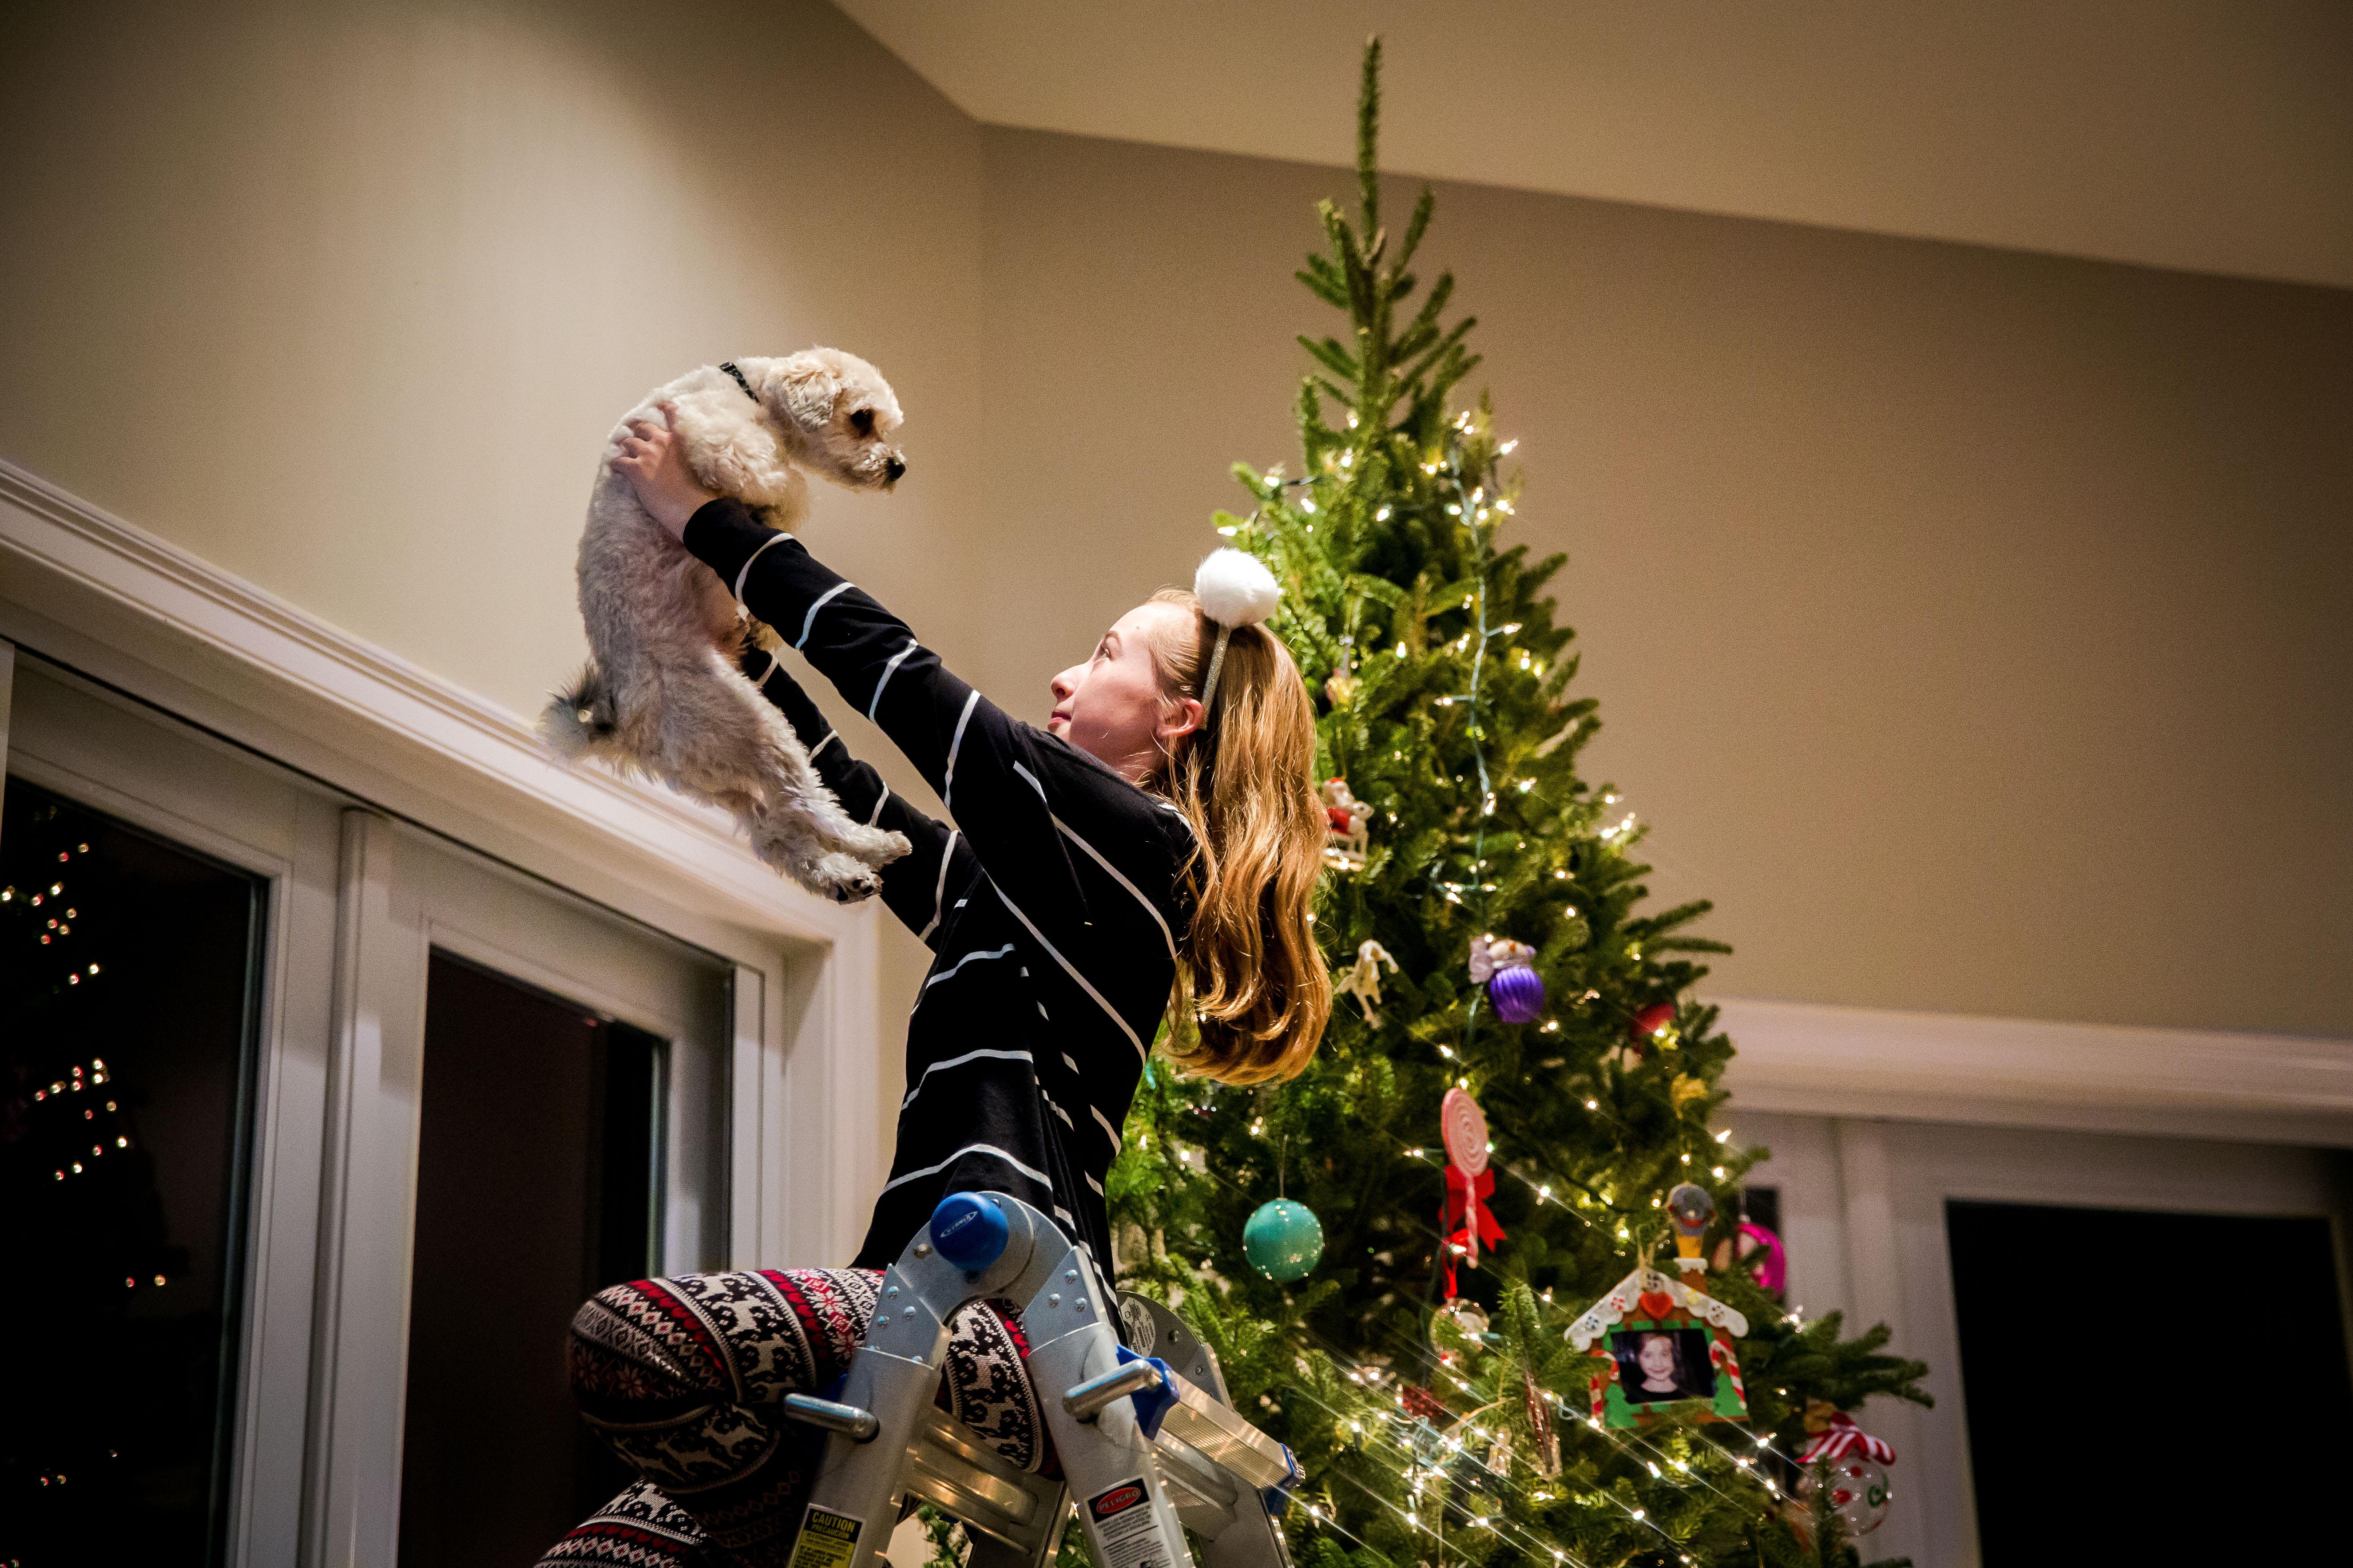 Little girl holding small white dog up overhead